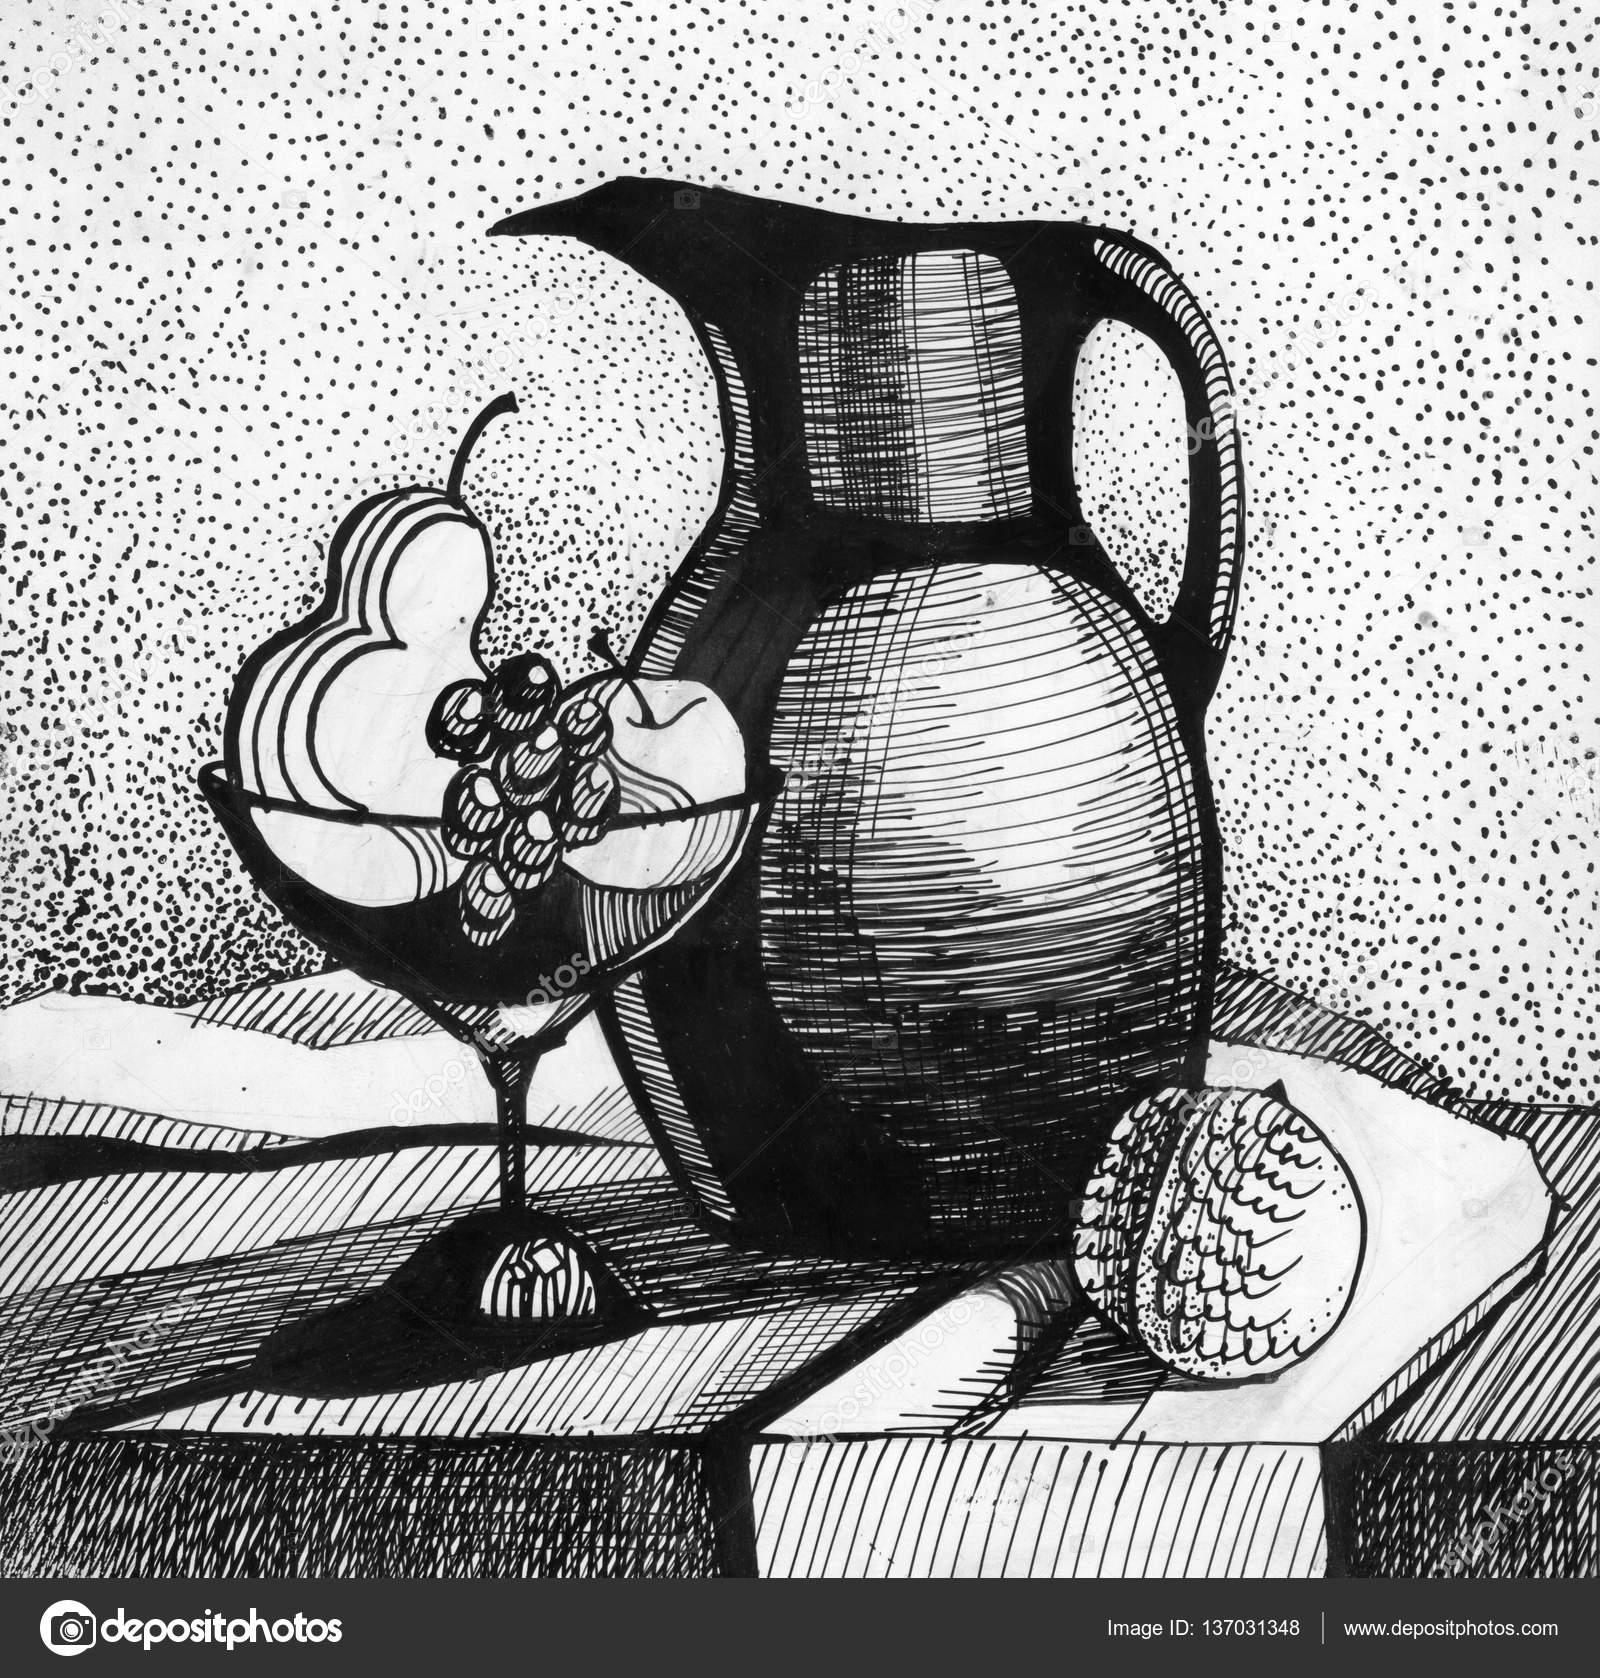 Ochutnavka Vin Zatisi Kresby Jidlo A Piti Zapisuje Pero Styl